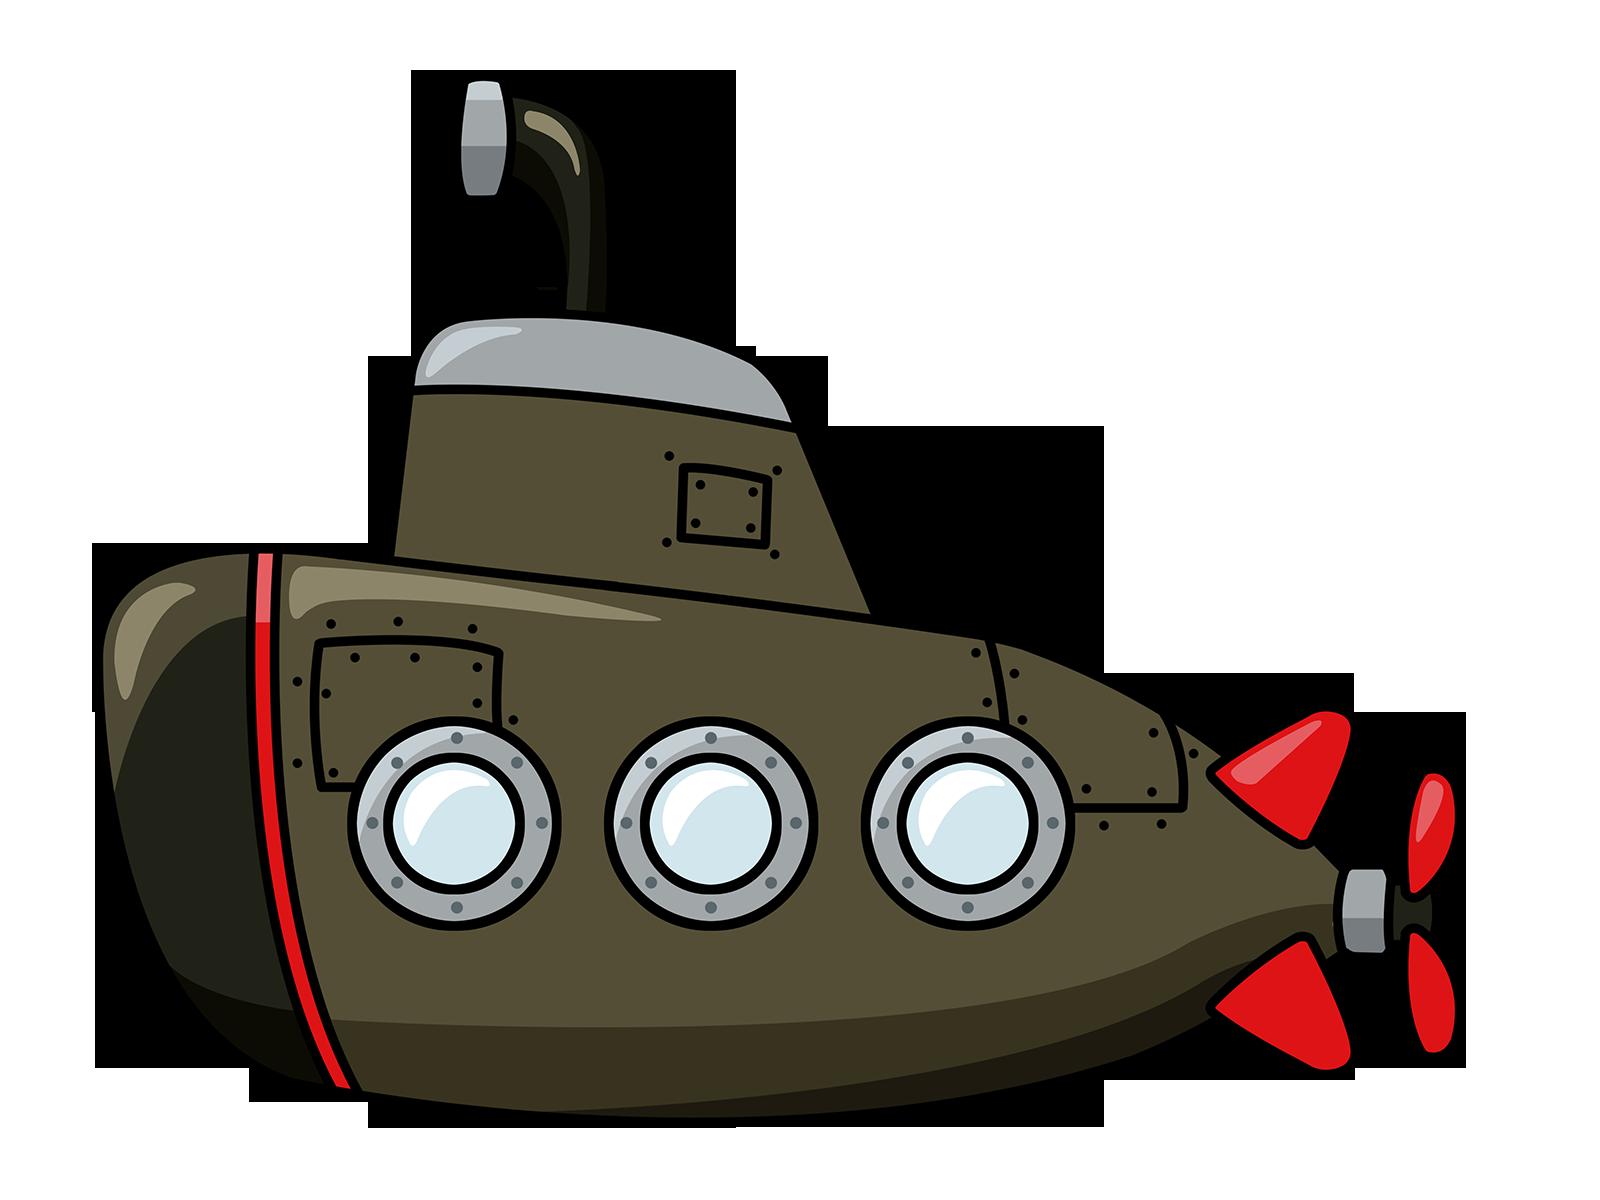 Submarino clipart